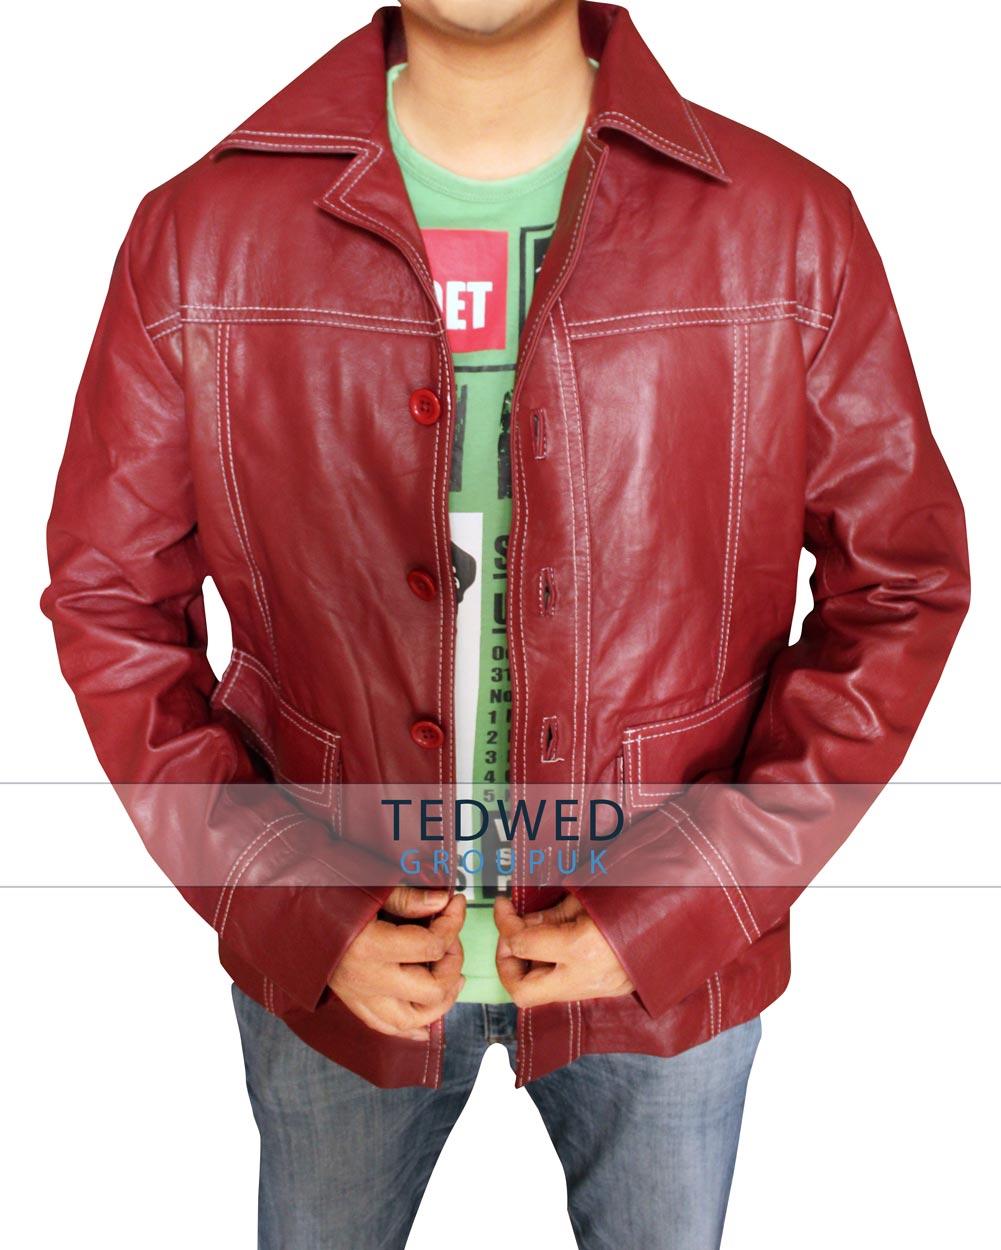 Brad Pitt Fight Club Leather Jacket